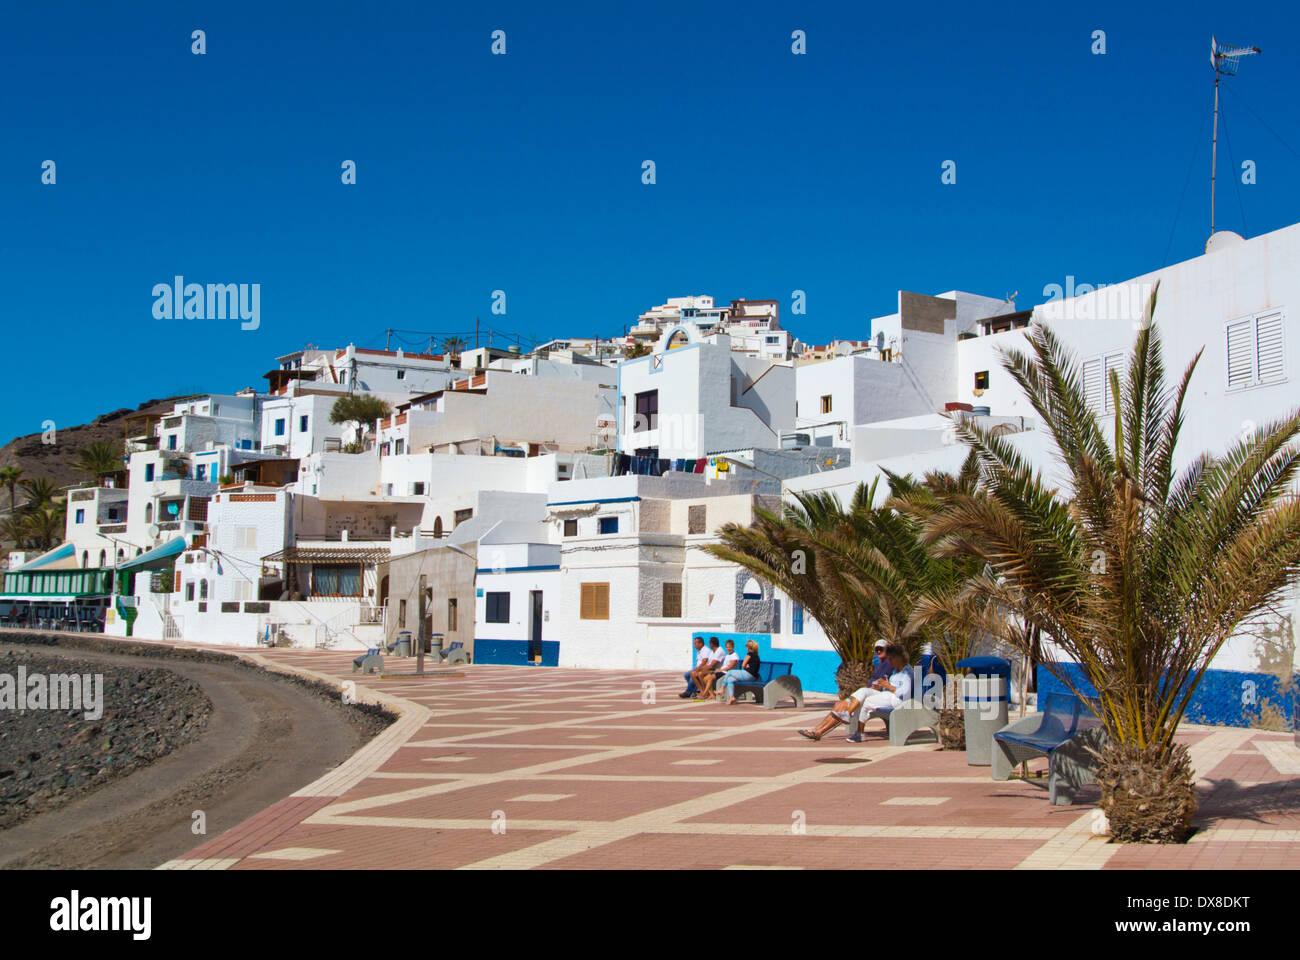 Paseo Miramar Strandpromenade, Las Playitas, Fuerteventura, Kanarische Inseln, Spanien, Europa Stockbild